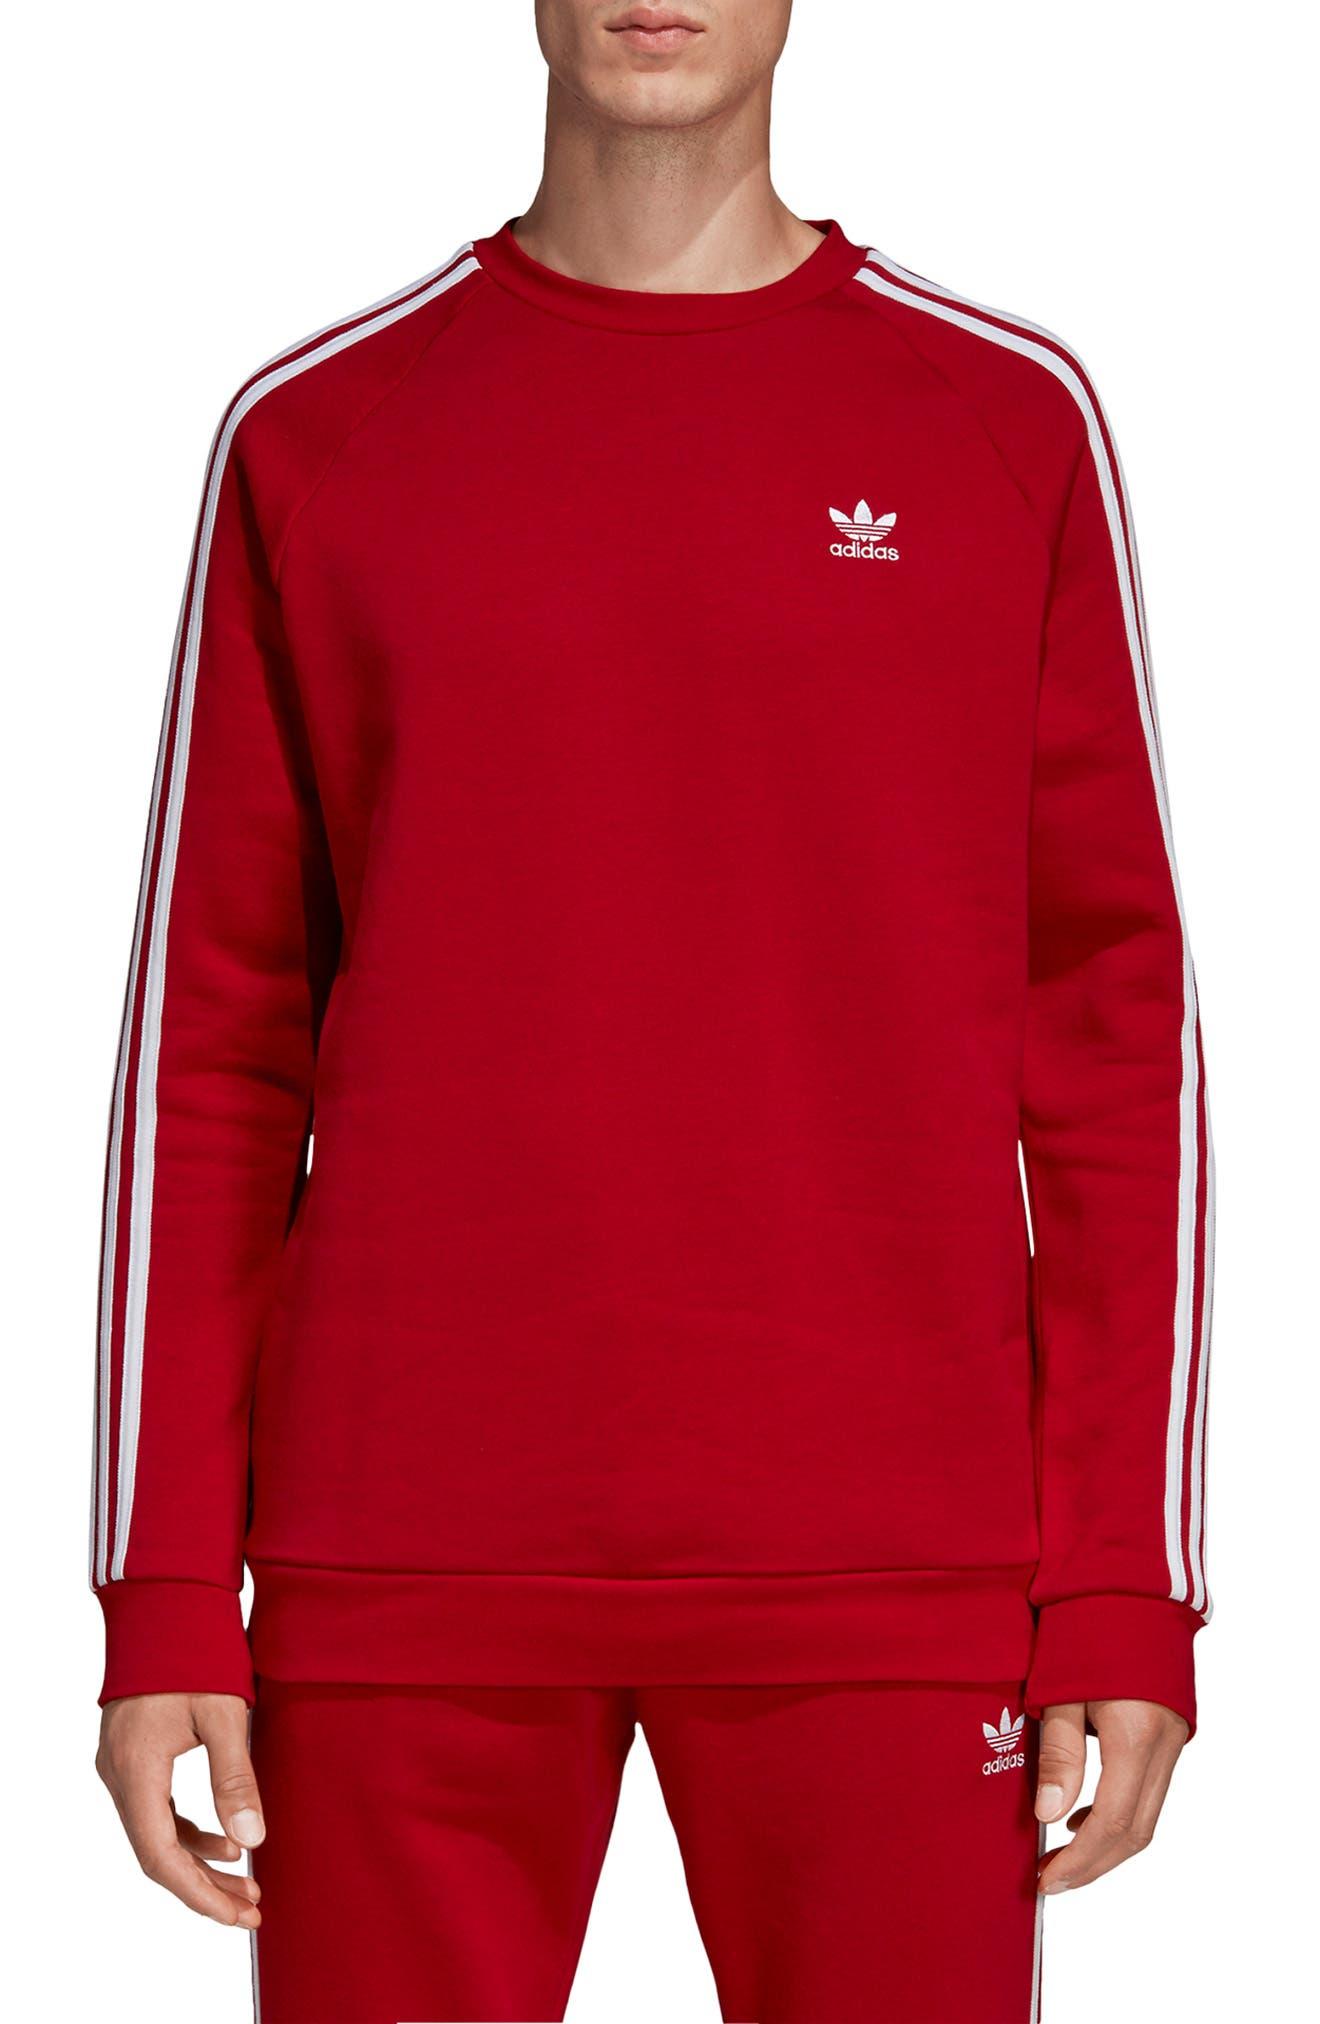 ADIDAS ORIGINALS, 3-Stripes Raglan Sweatshirt, Main thumbnail 1, color, POWER RED